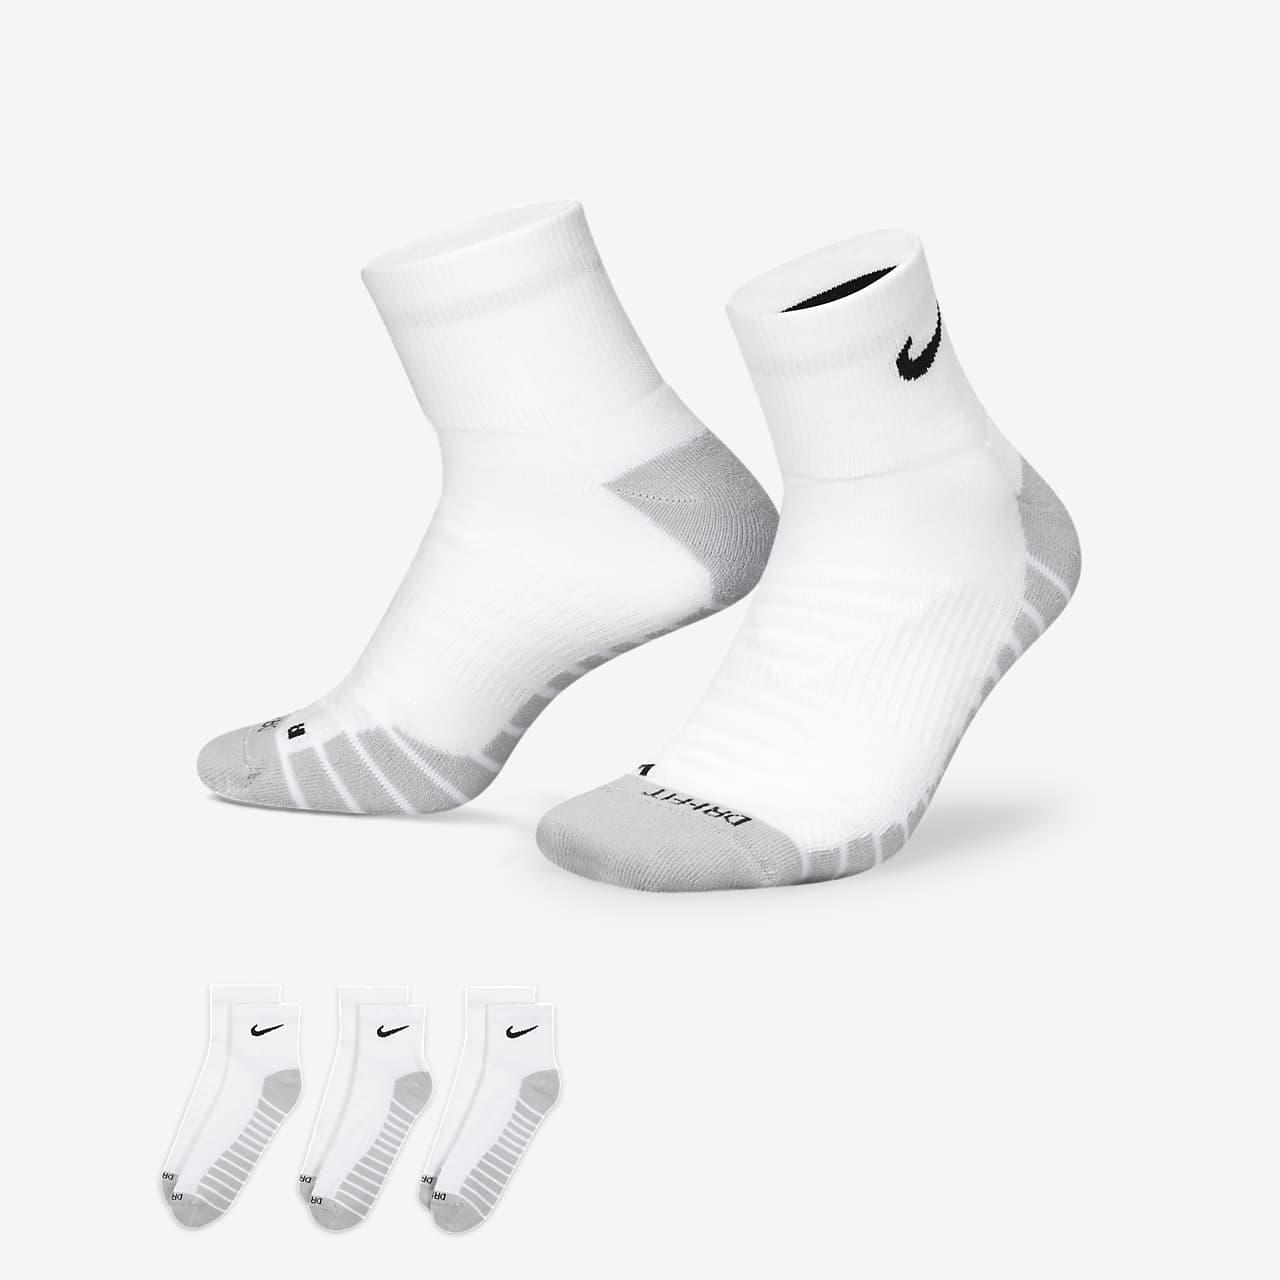 37d6192a8ae Nike Dry Cushion Quarter Trainingssokken (3 paar). Nike.com NL